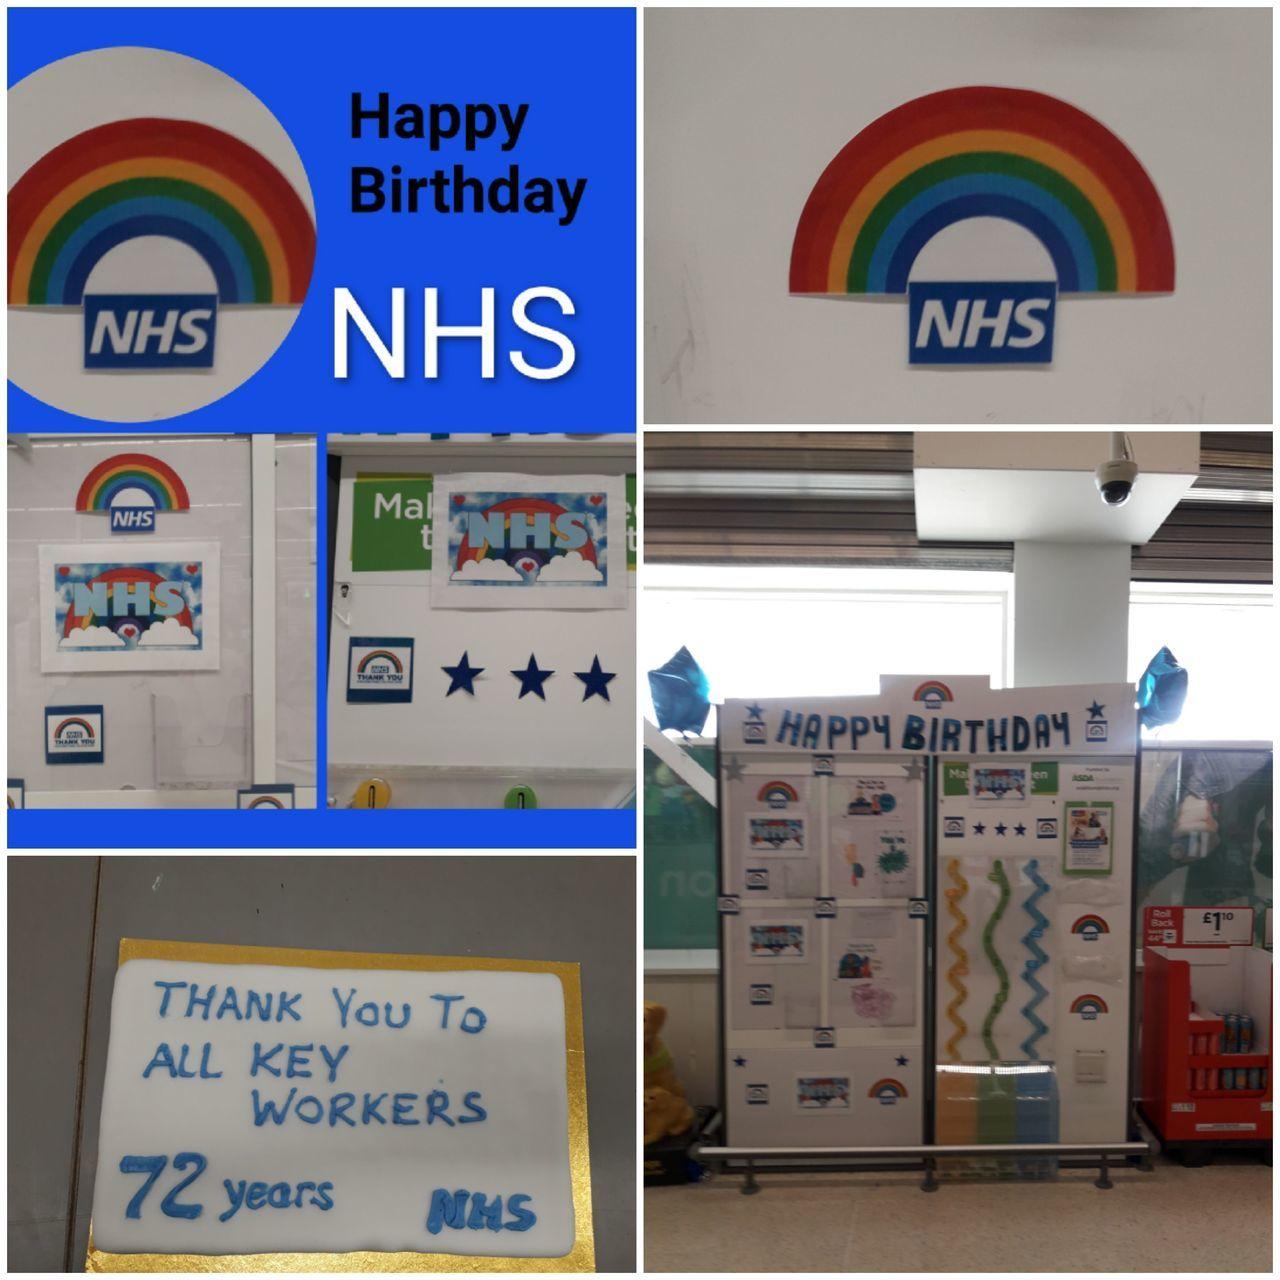 Happy 72nd birthday NHS from ASDA Hartlepool. | Asda Hartlepool